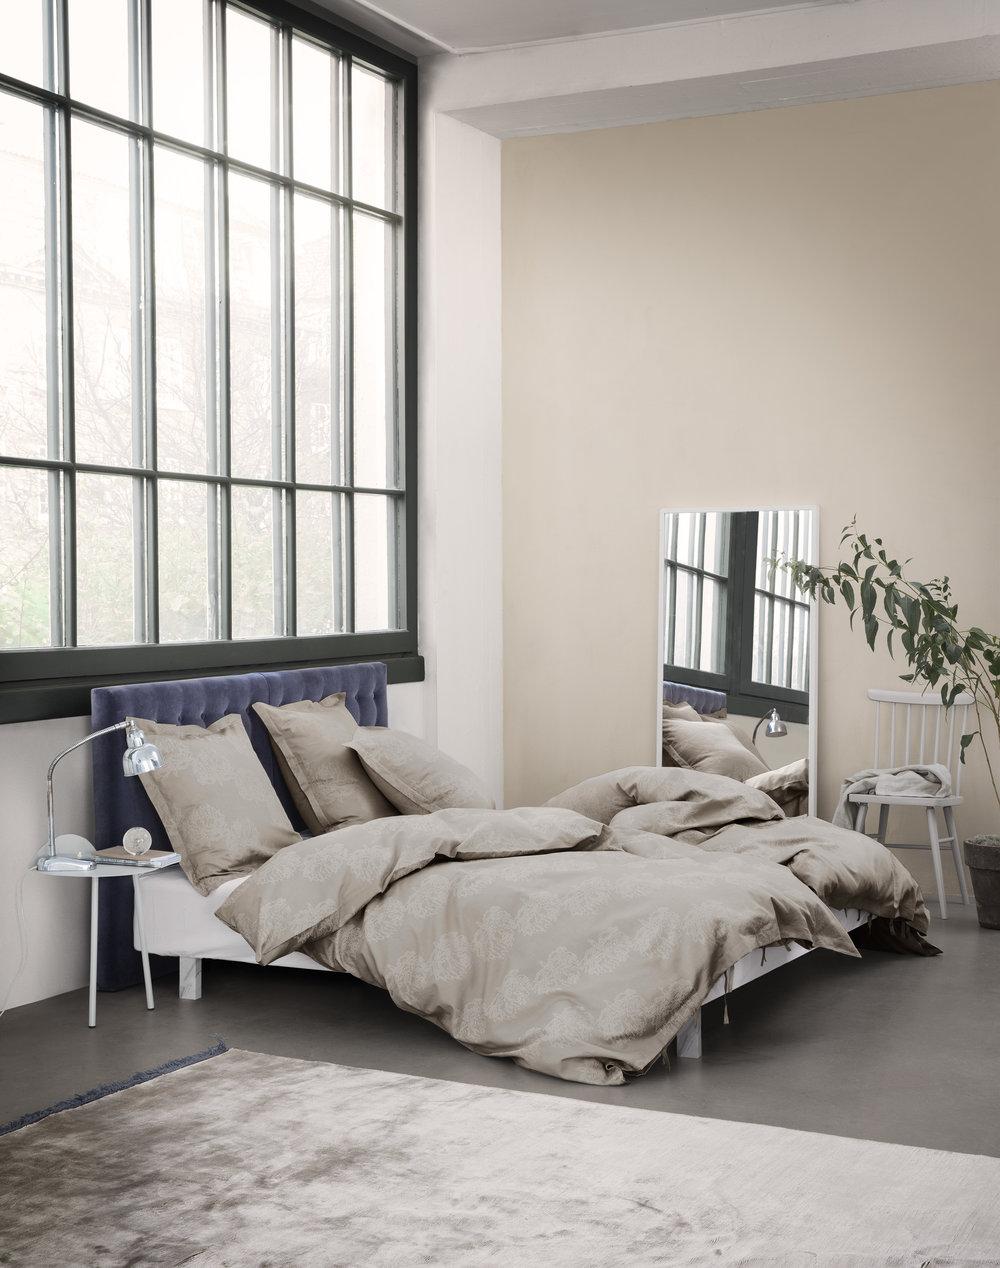 CLOVER_bed_linen_RYE_interior.jpg